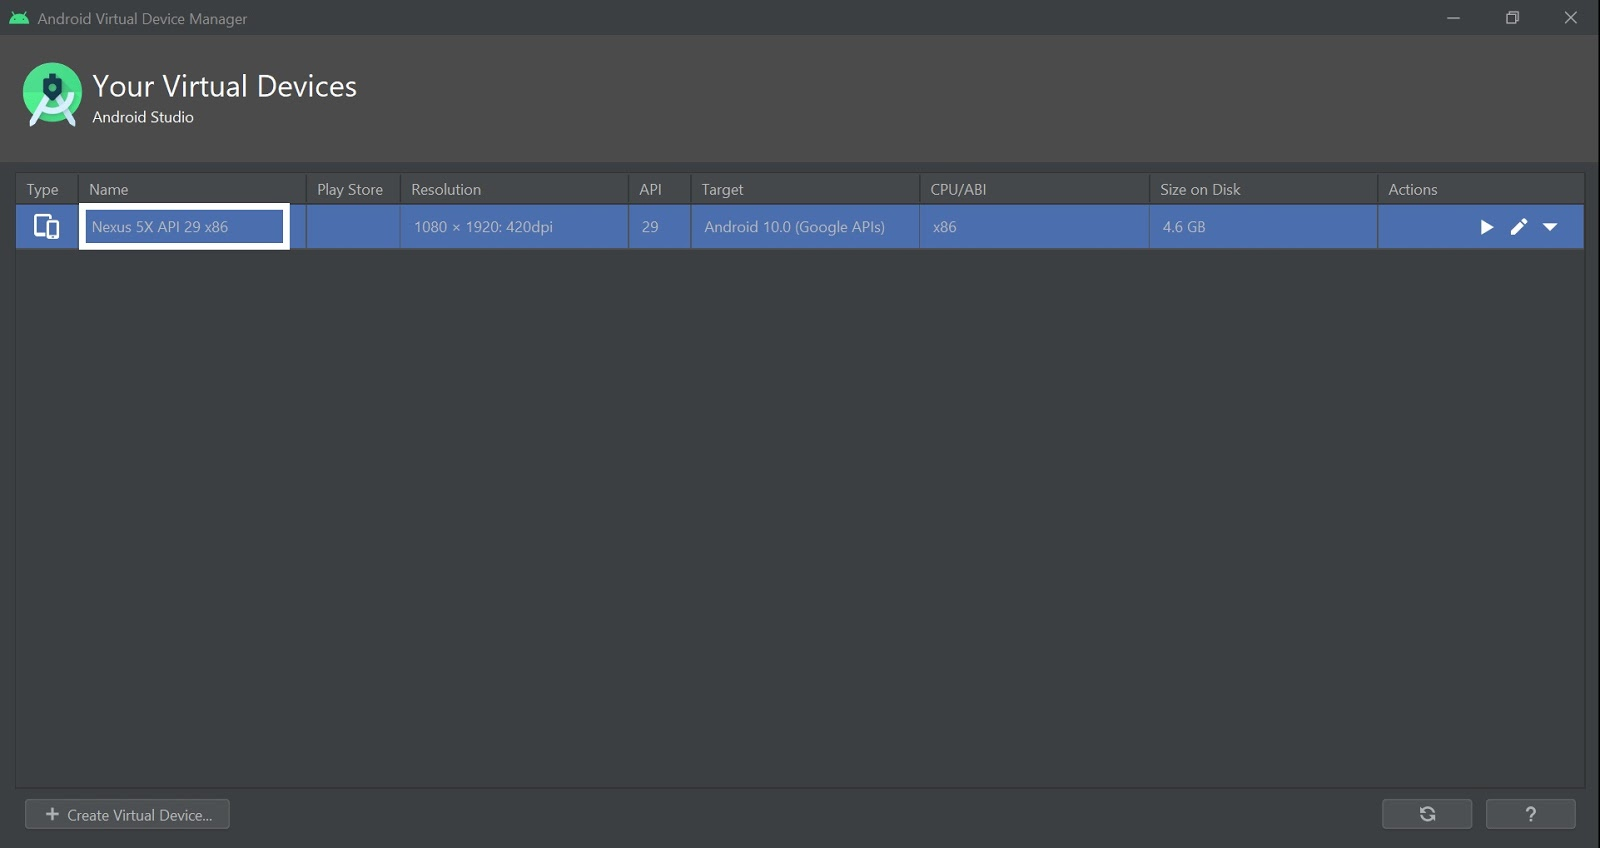 Geting AVD Emulator Name of Android Studio